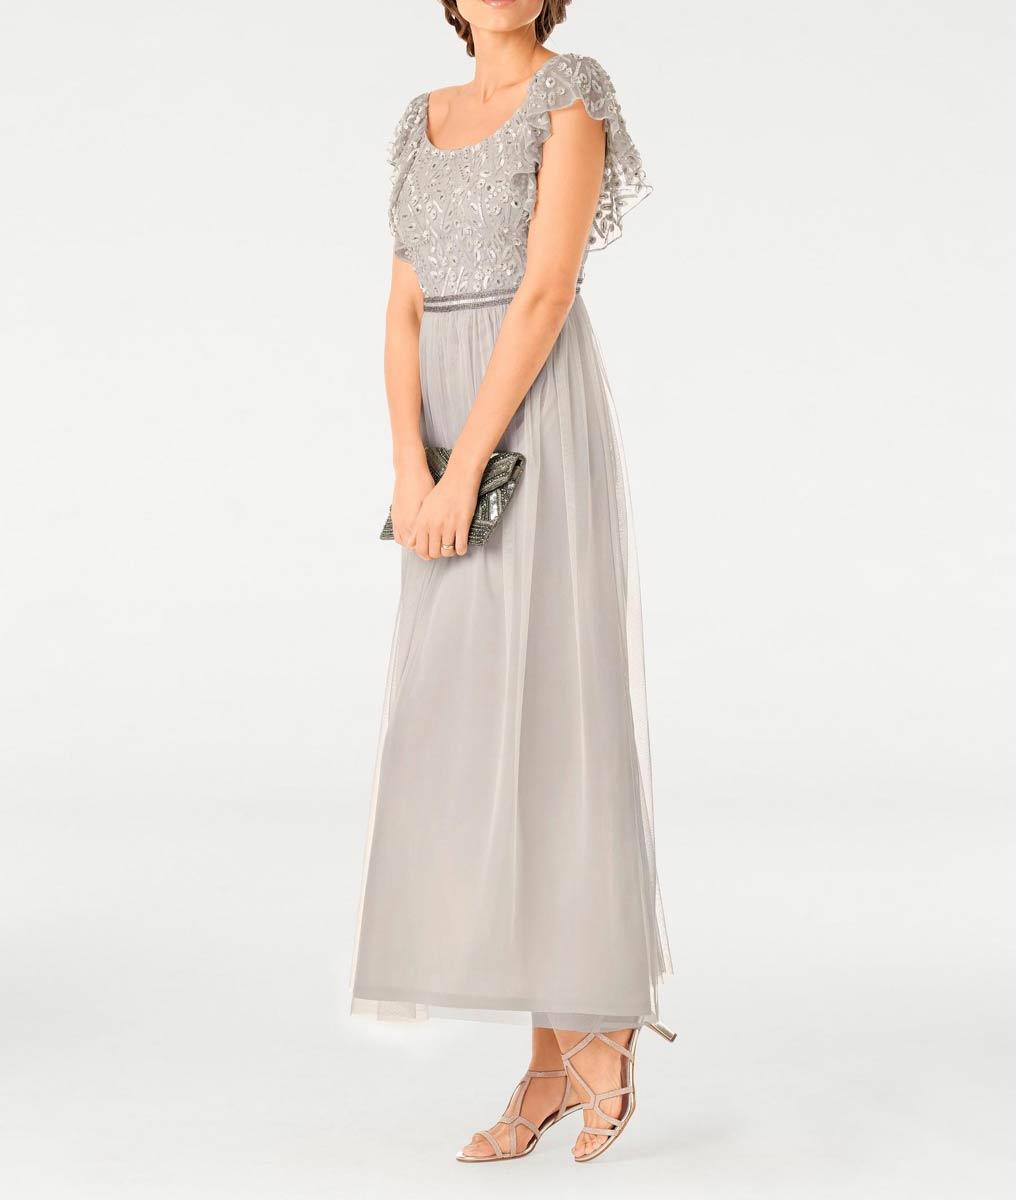 Festmoden Ashley Brooke Abendkleid lang, silbergrau 013.535 013.535 Missforty